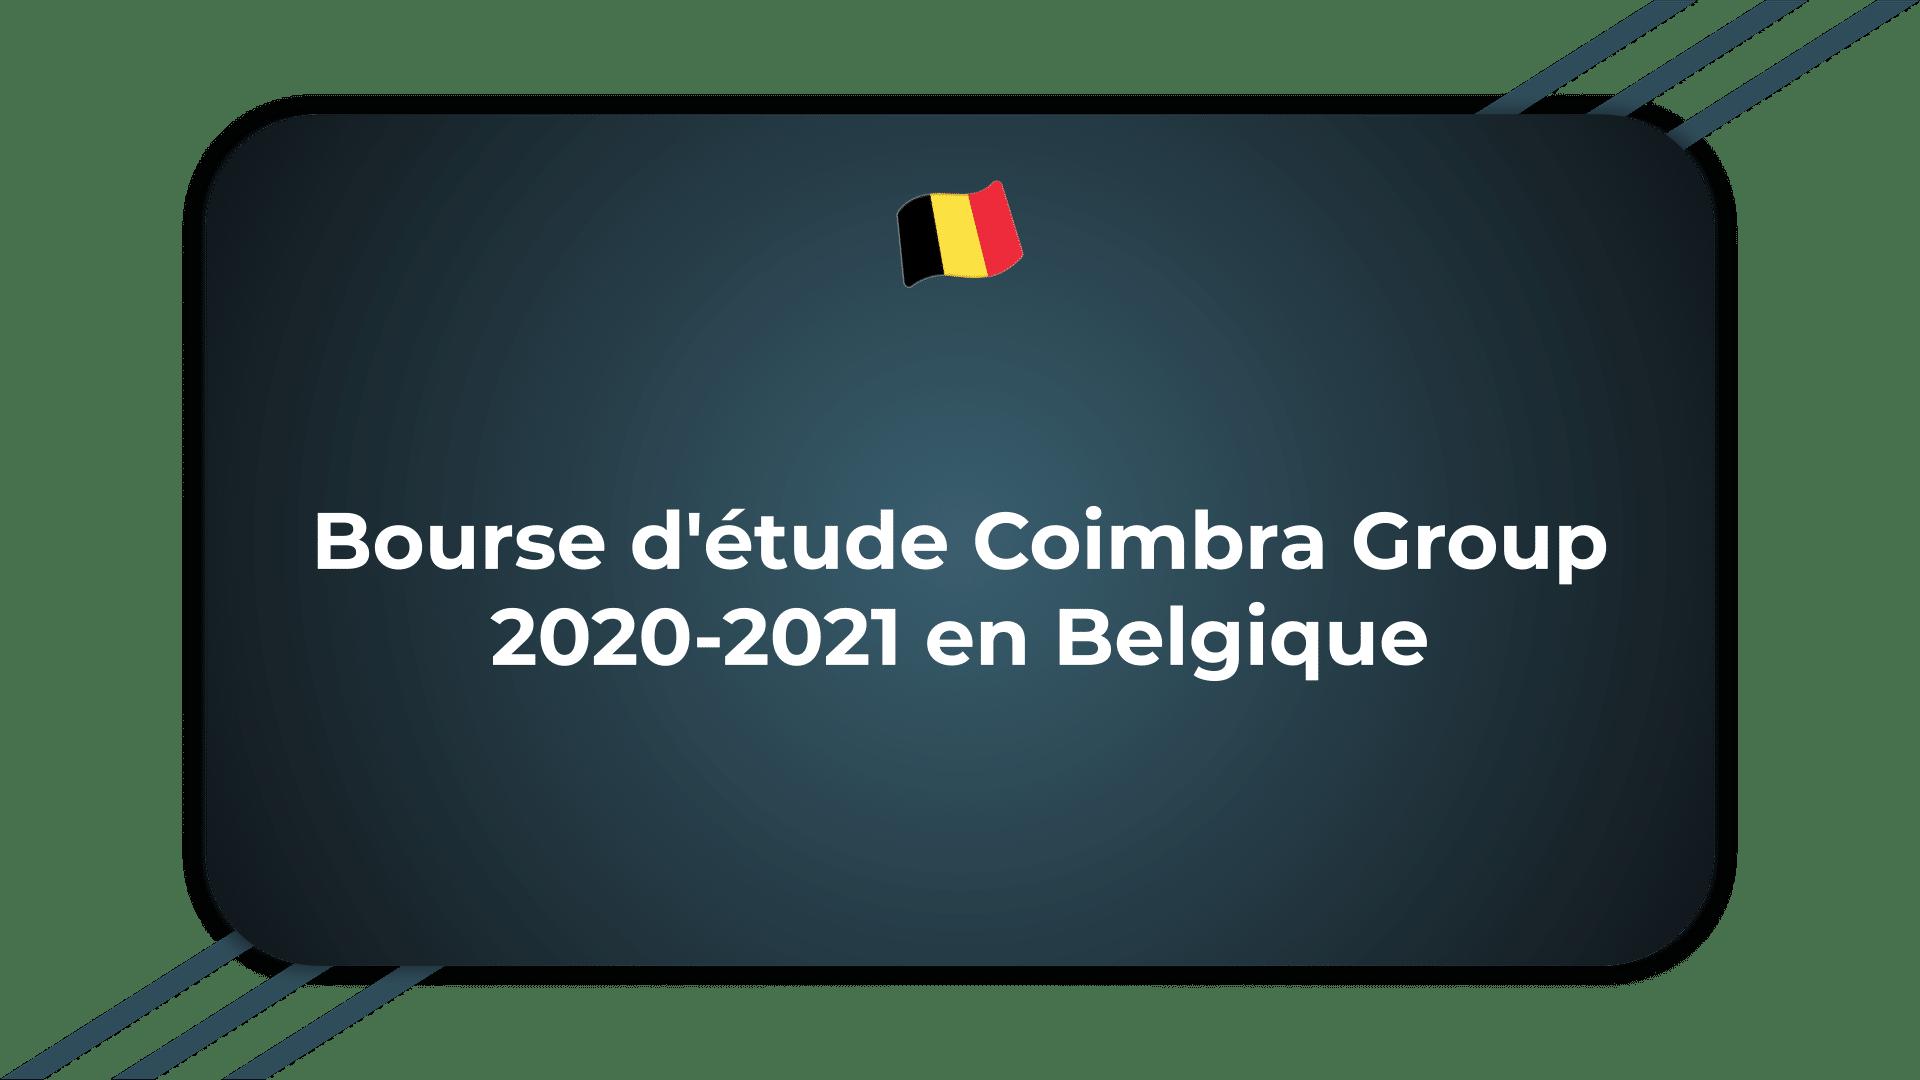 Bourse d'étude Coimbra Group